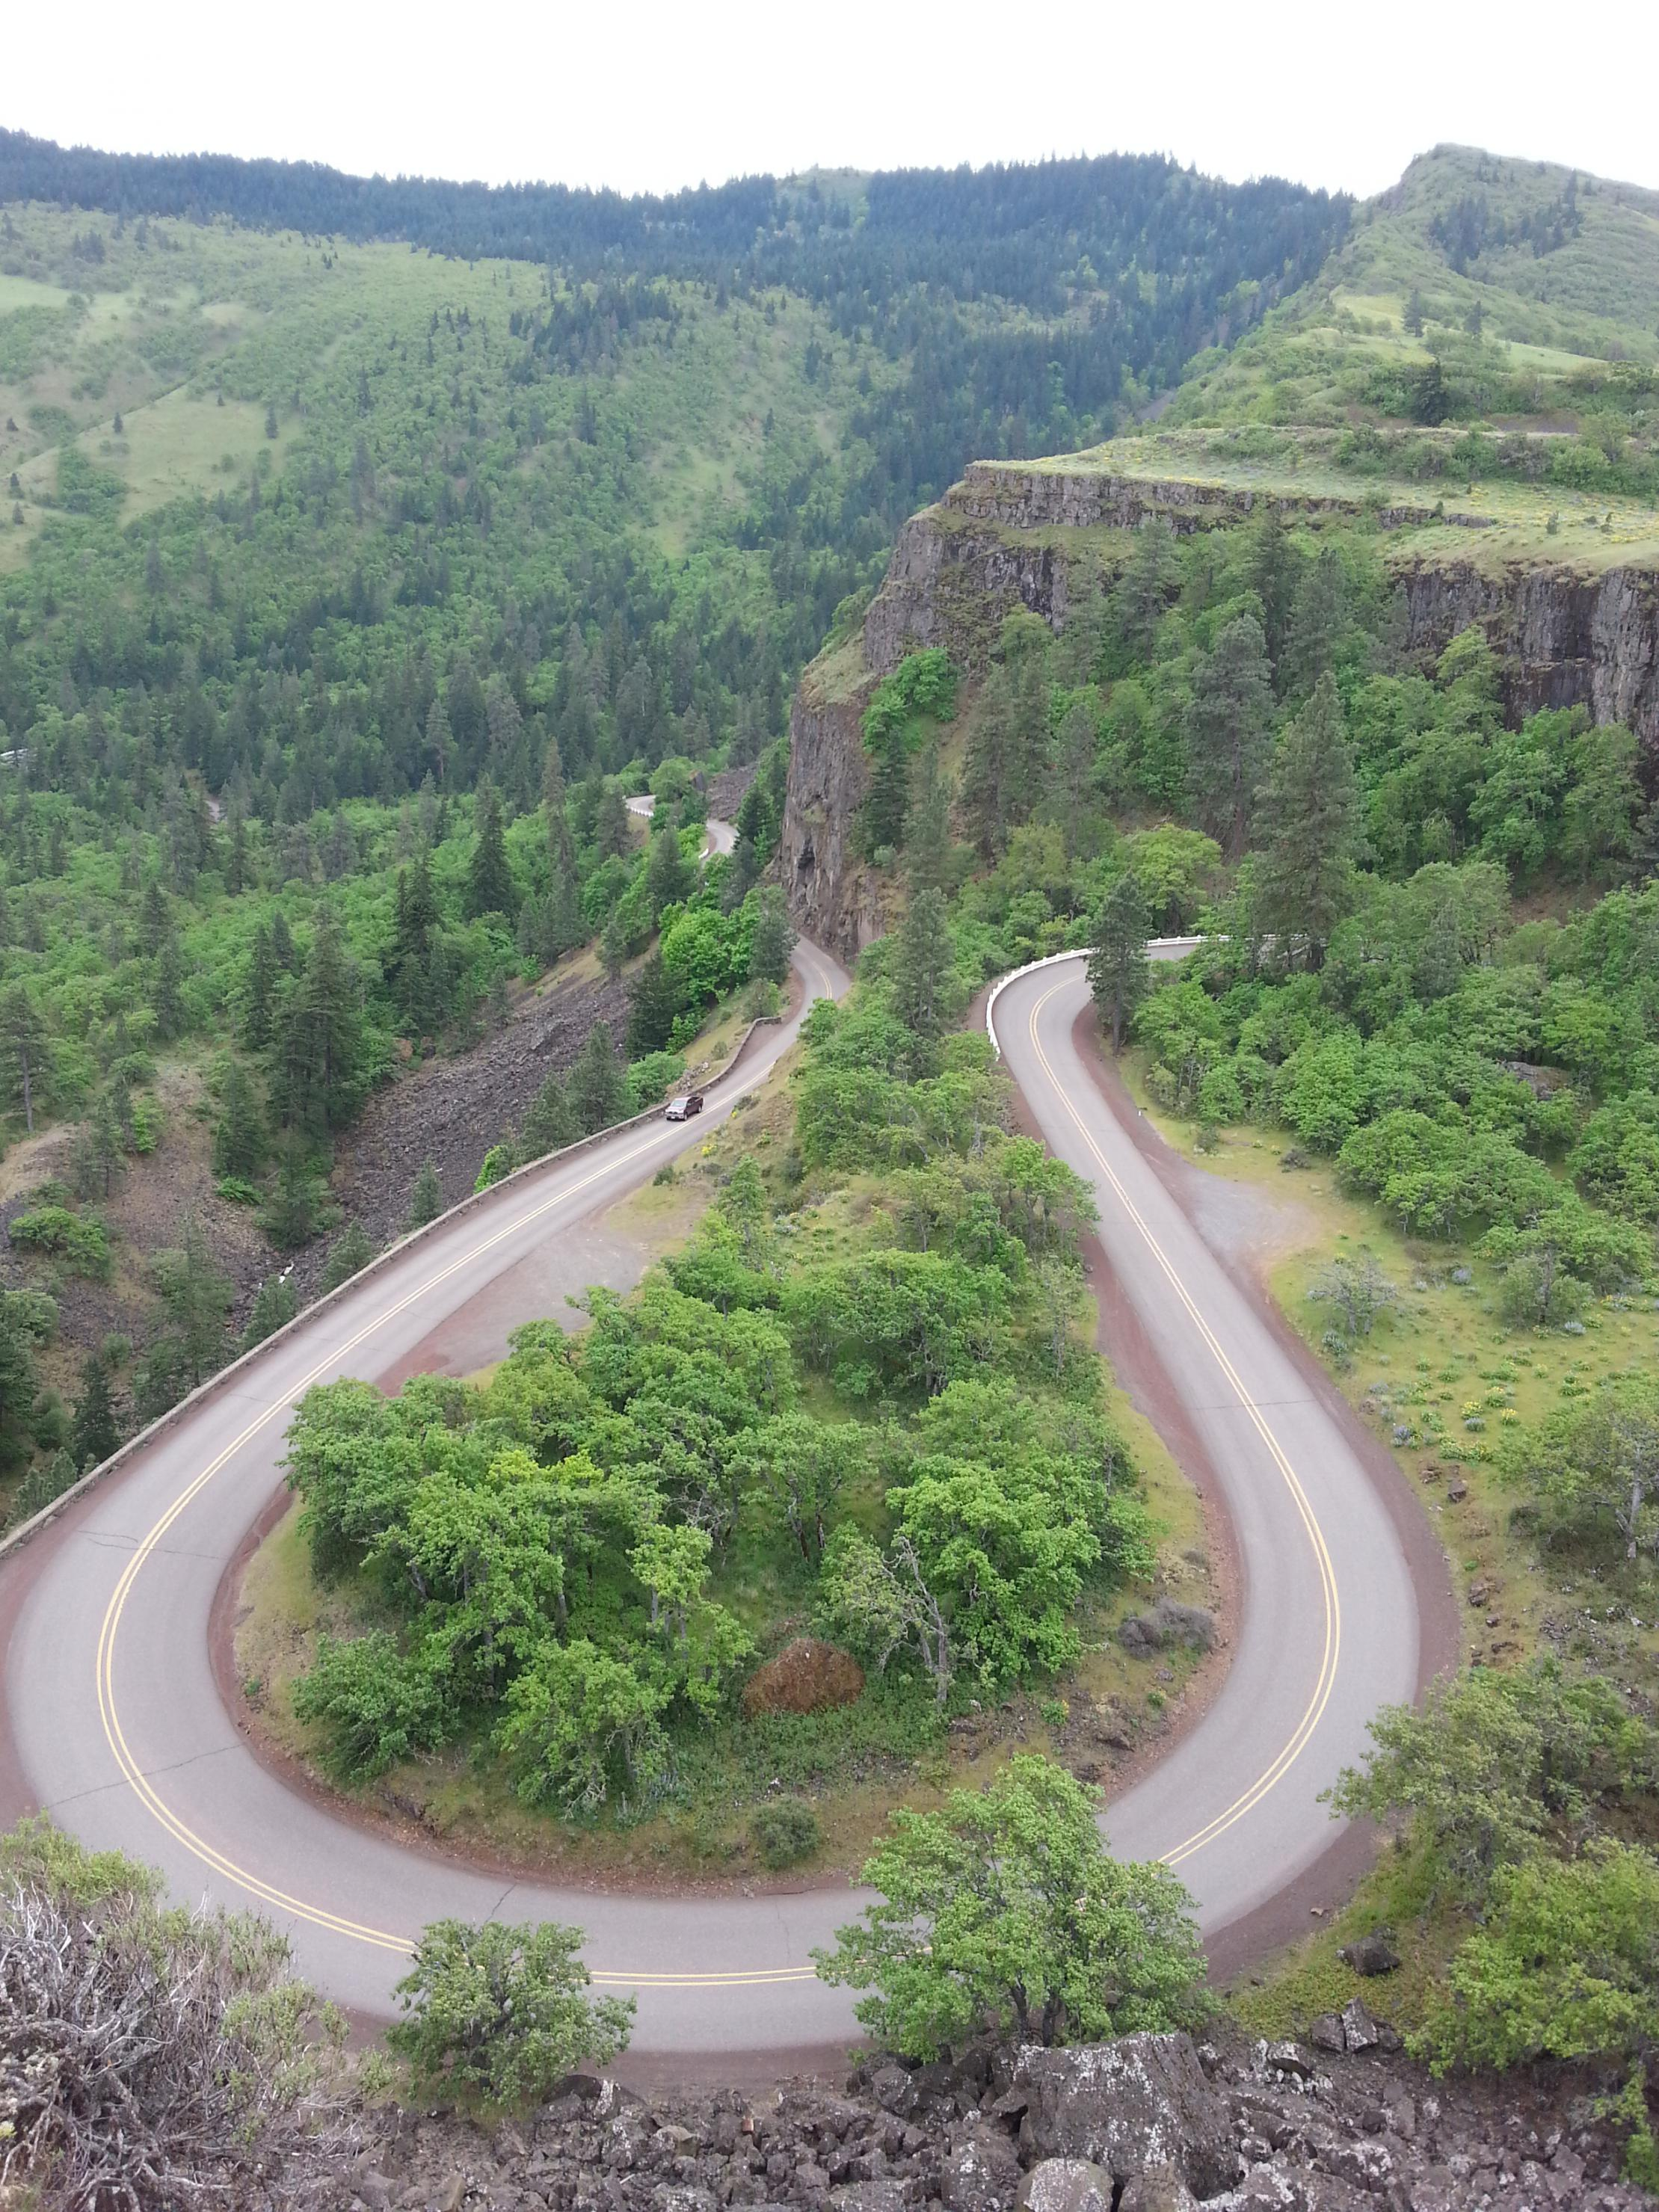 Oregon Highway 30 - Ducati.ms - The Ultimate Ducati Forum